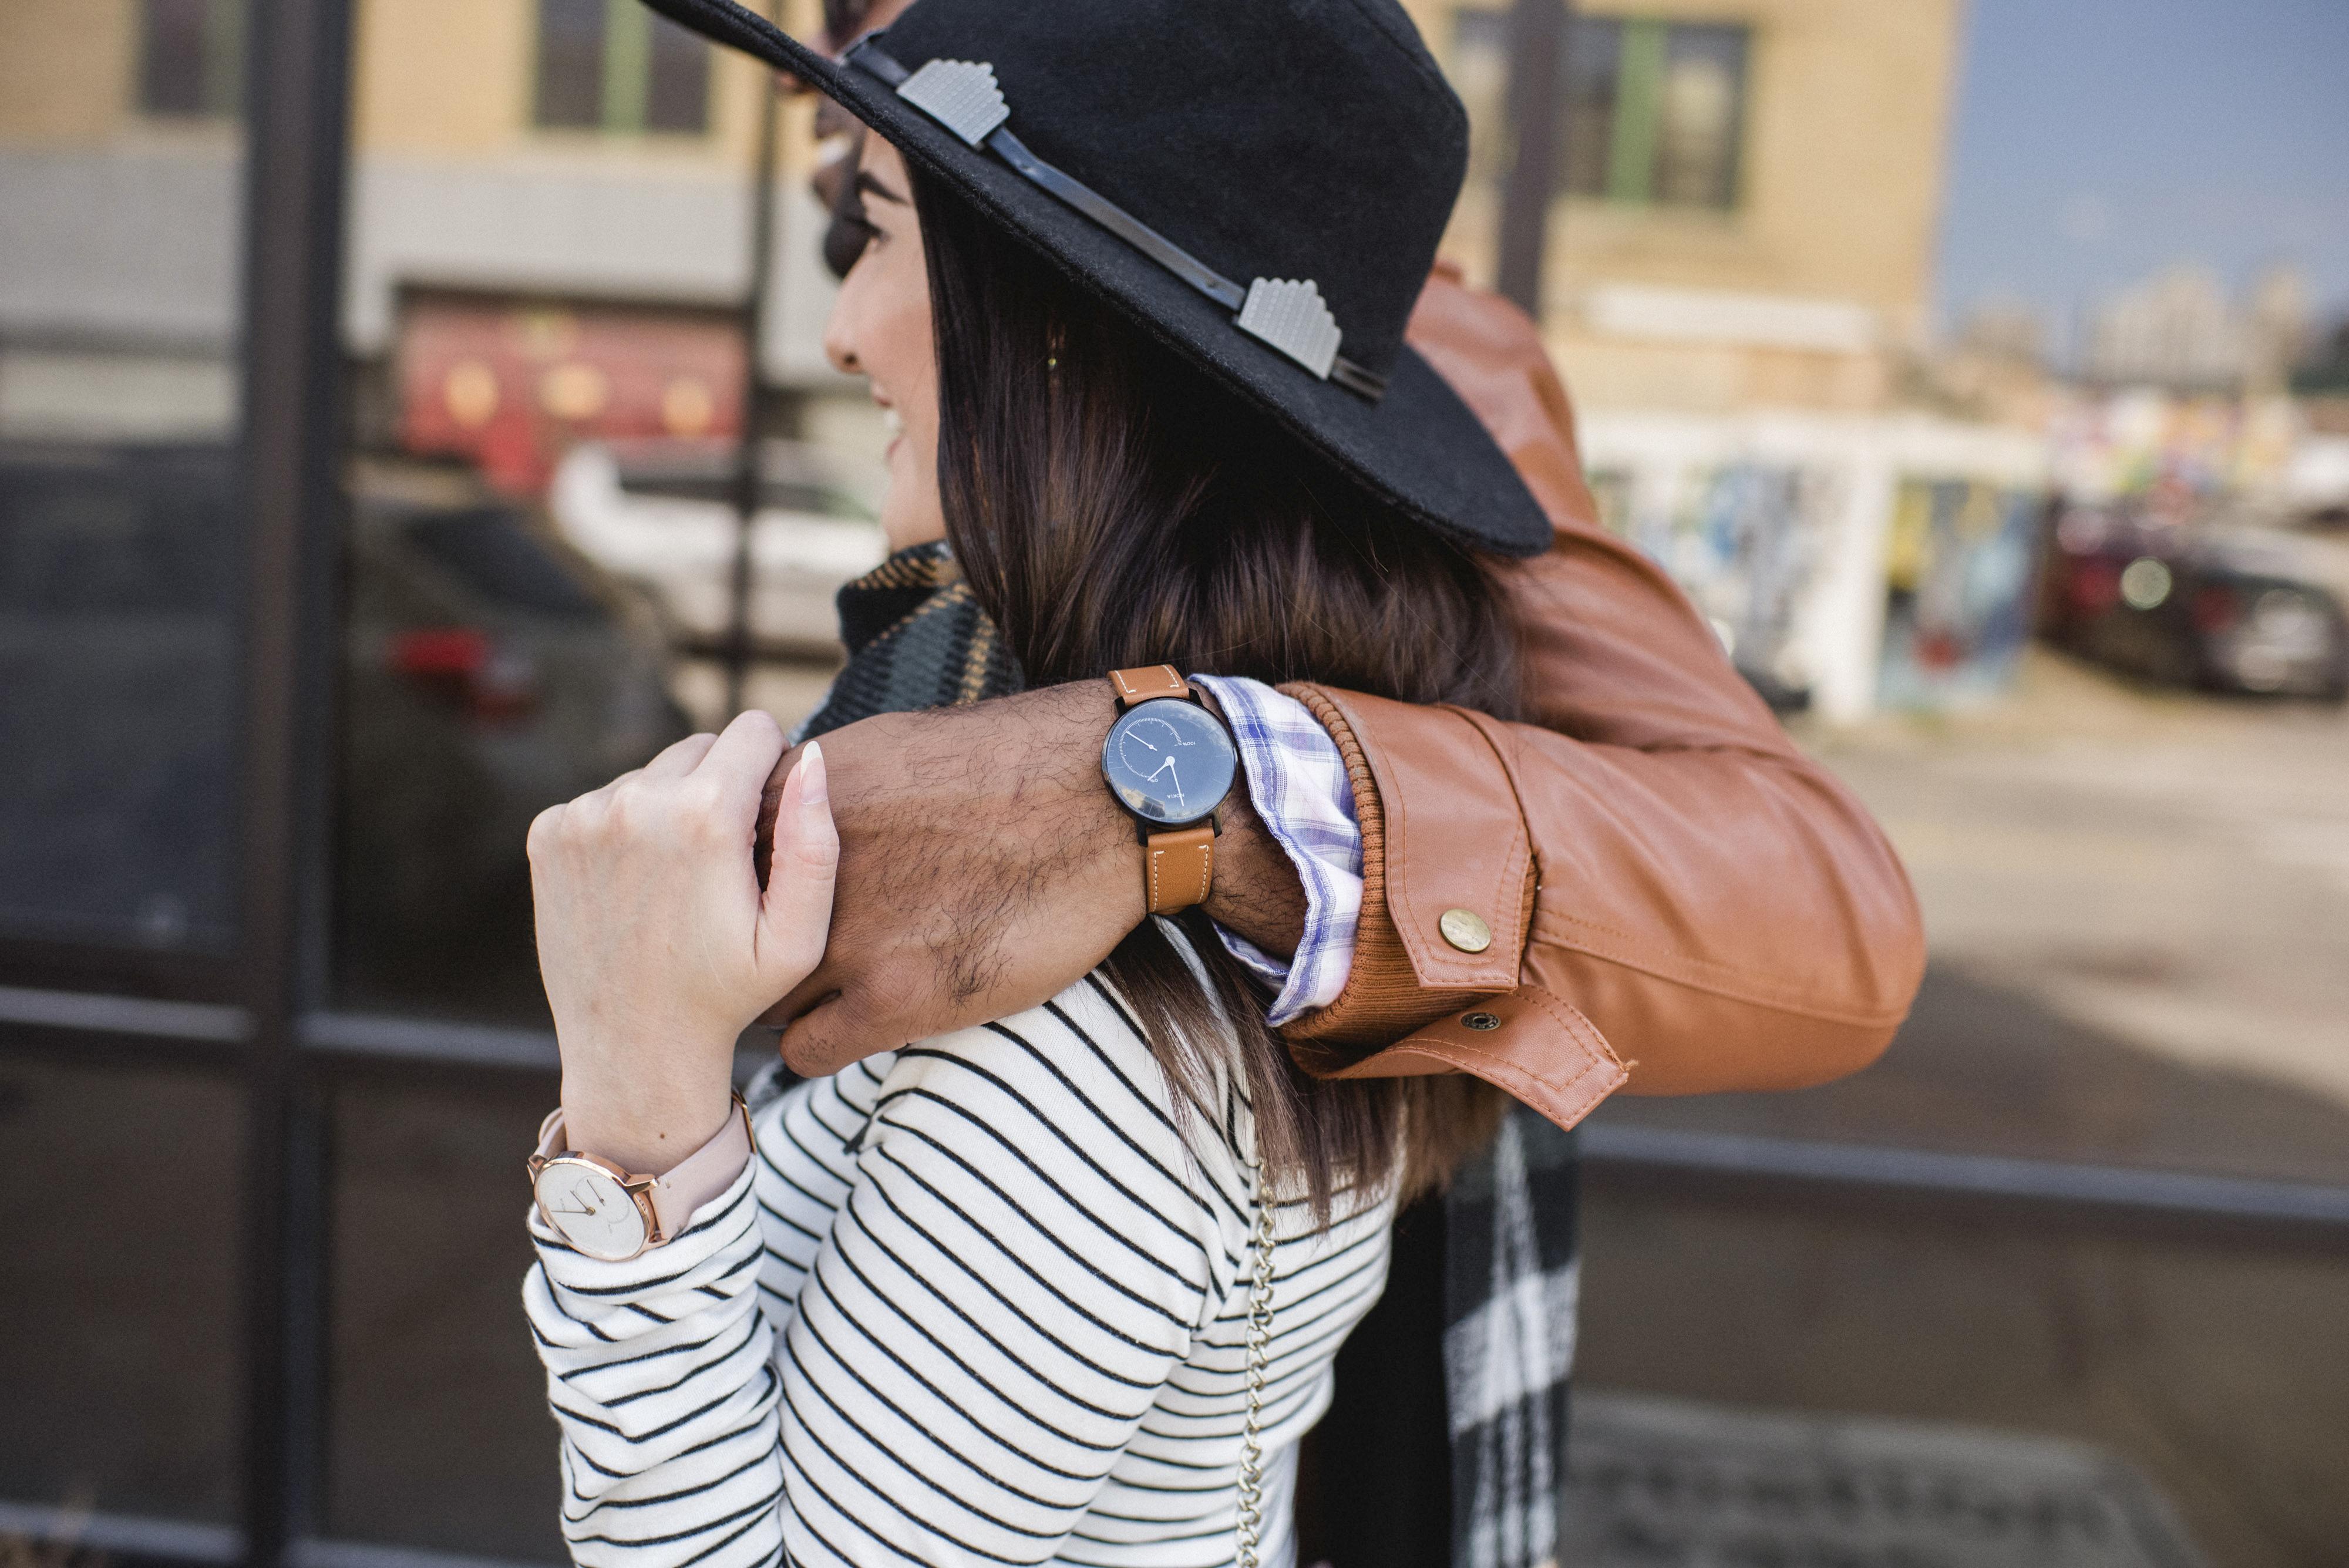 Nokia Steel Watch on a man